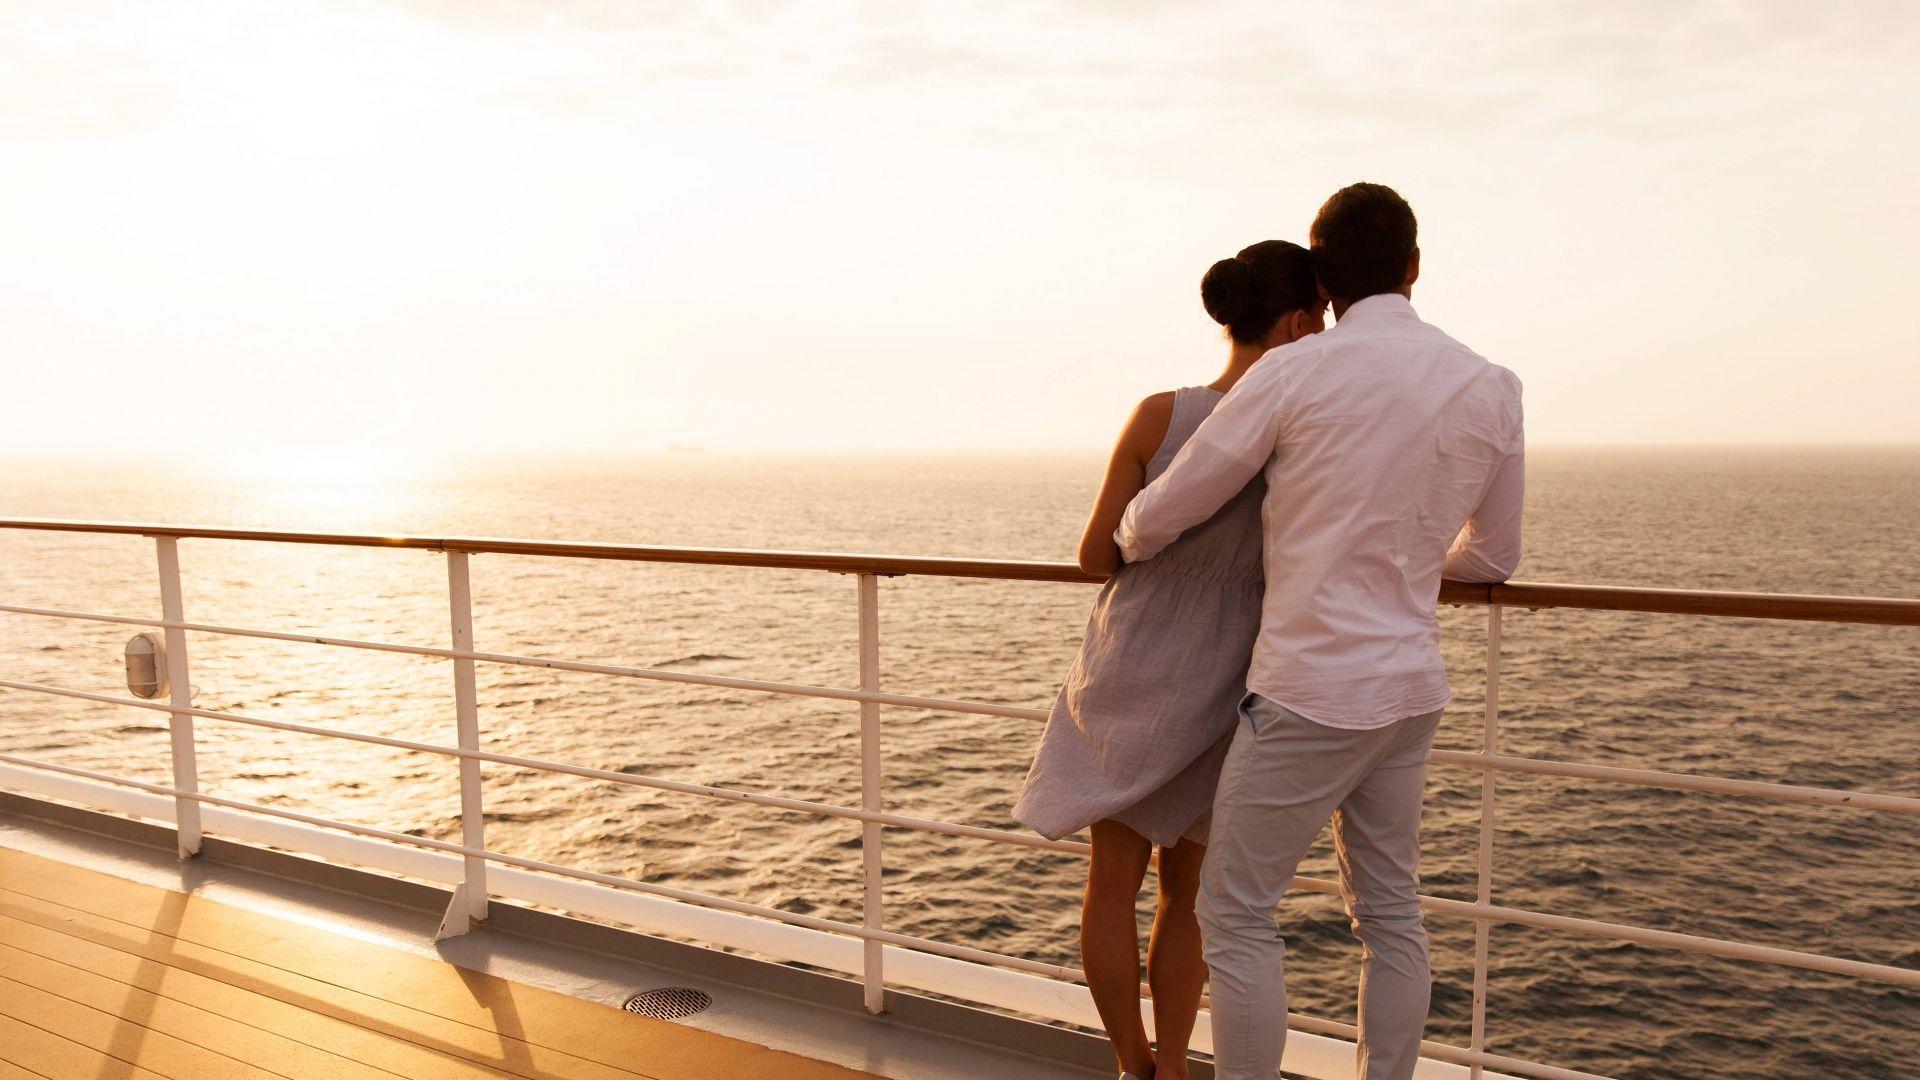 Romantiška kelionės akimirka